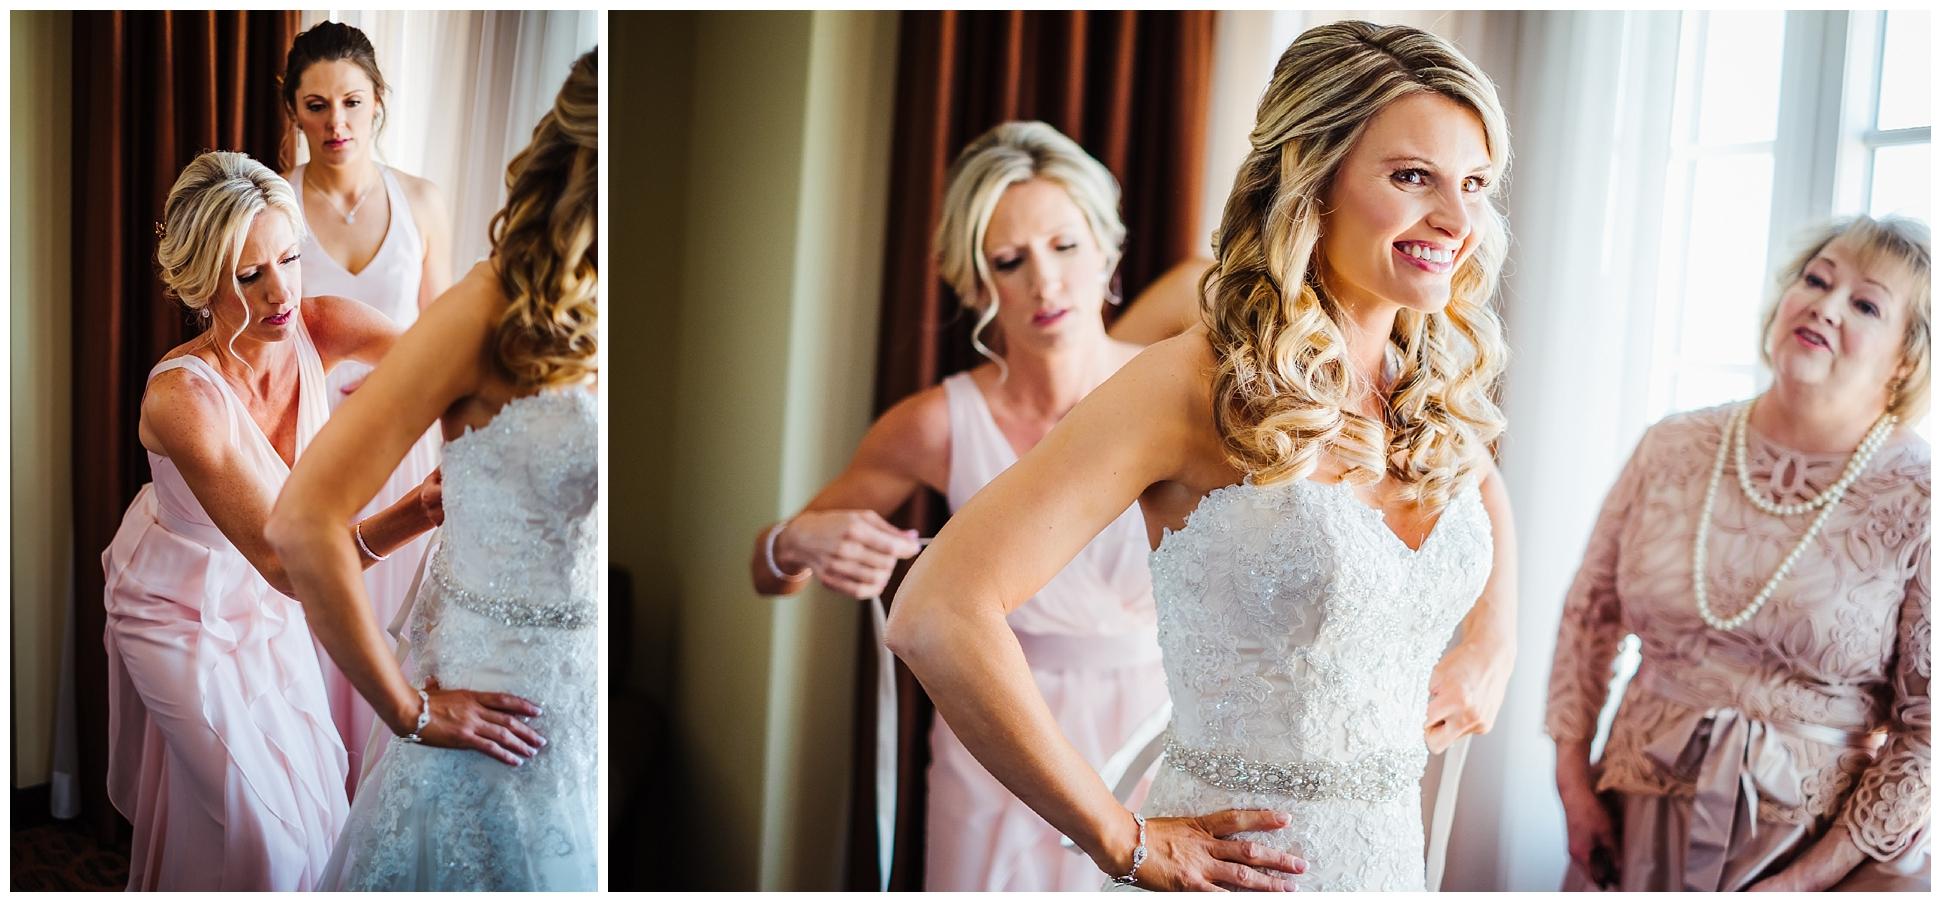 tampa-bradenton-wedding-photographer-south-florida-museum-classic-blush-gold-alpacas-sparklers_0009.jpg